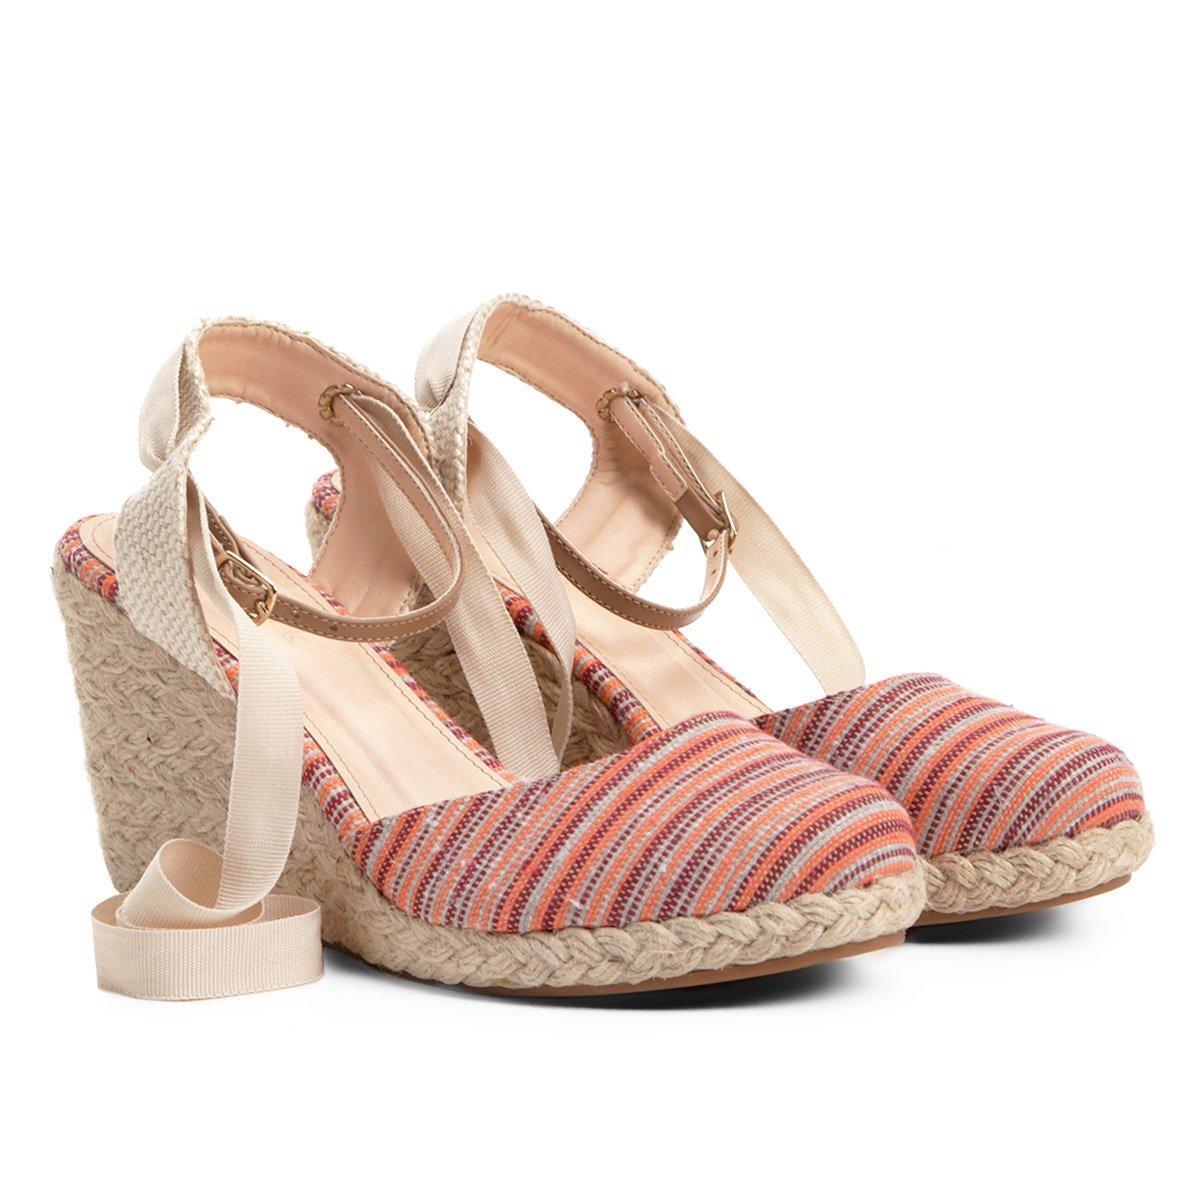 Sandália Sandália Feminina Anabela Laranja Listrada Anabela Anabela Shoestock Feminina Laranja Sandália Listrada Shoestock tnCqXAPx0